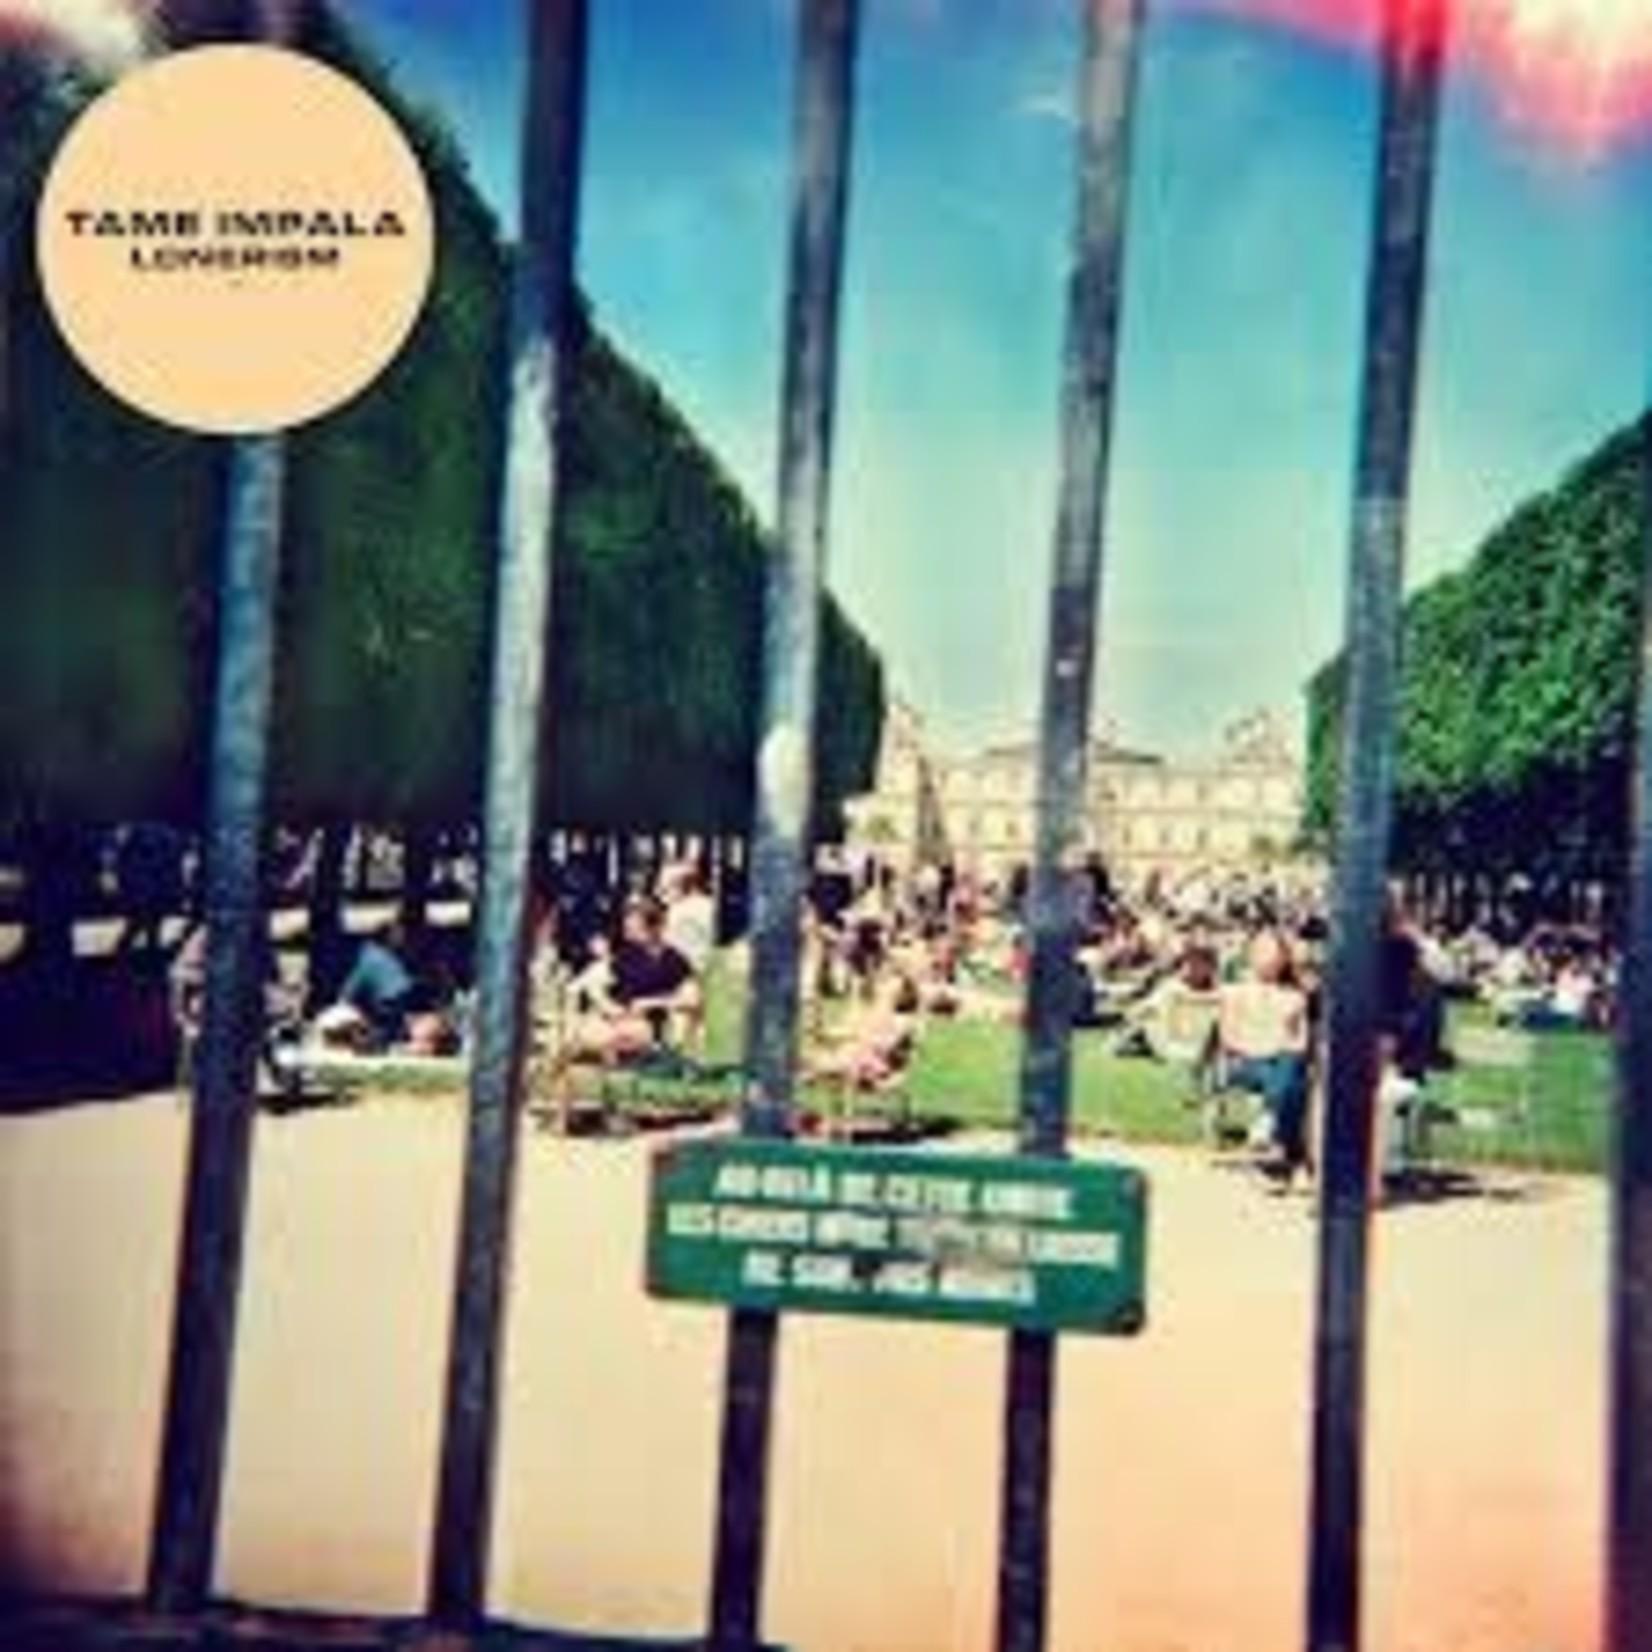 Vinyl Tame Impala - Lonerism